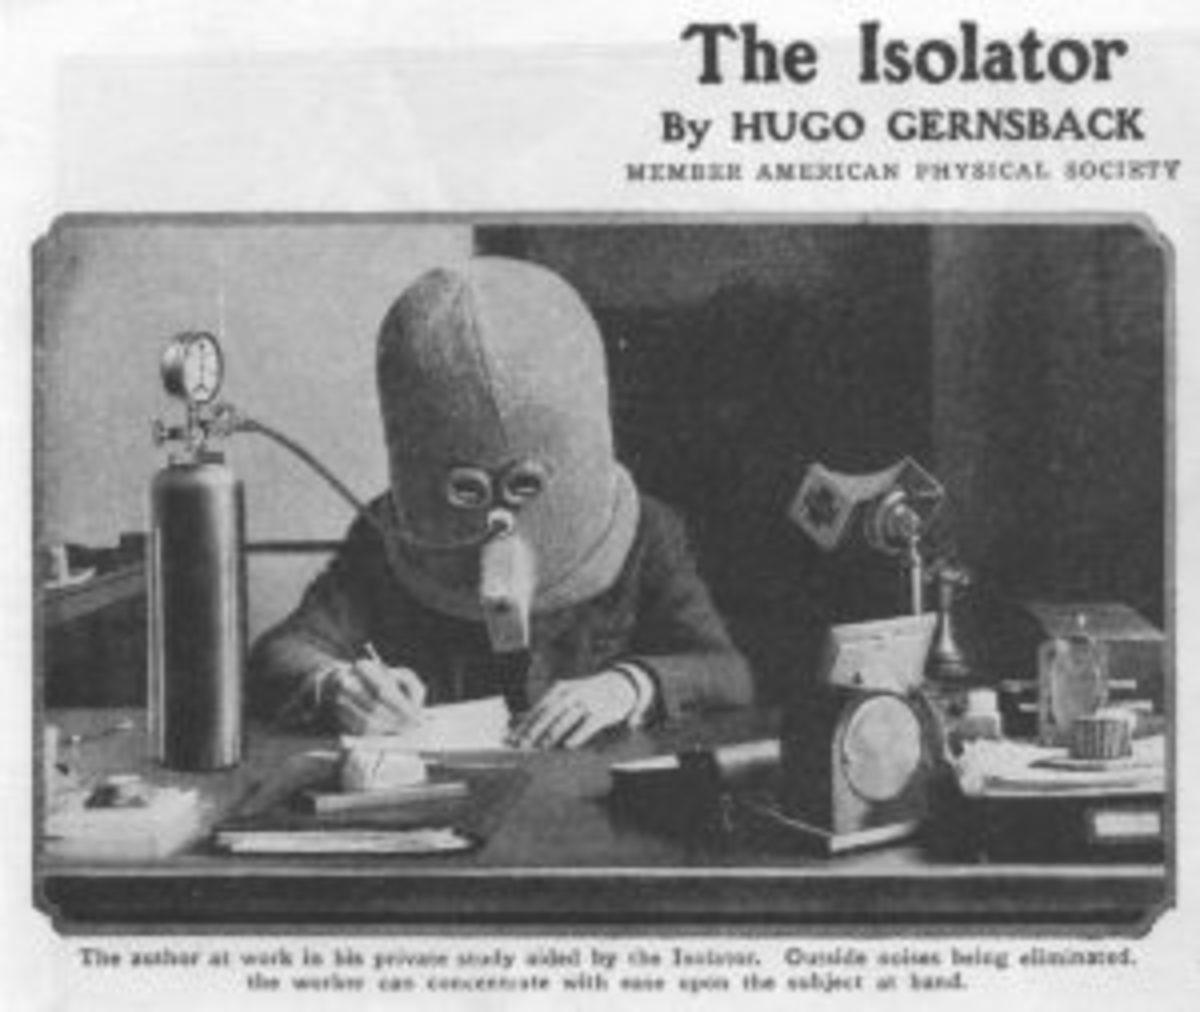 The Isolator Helmet by Hugo Gernsback